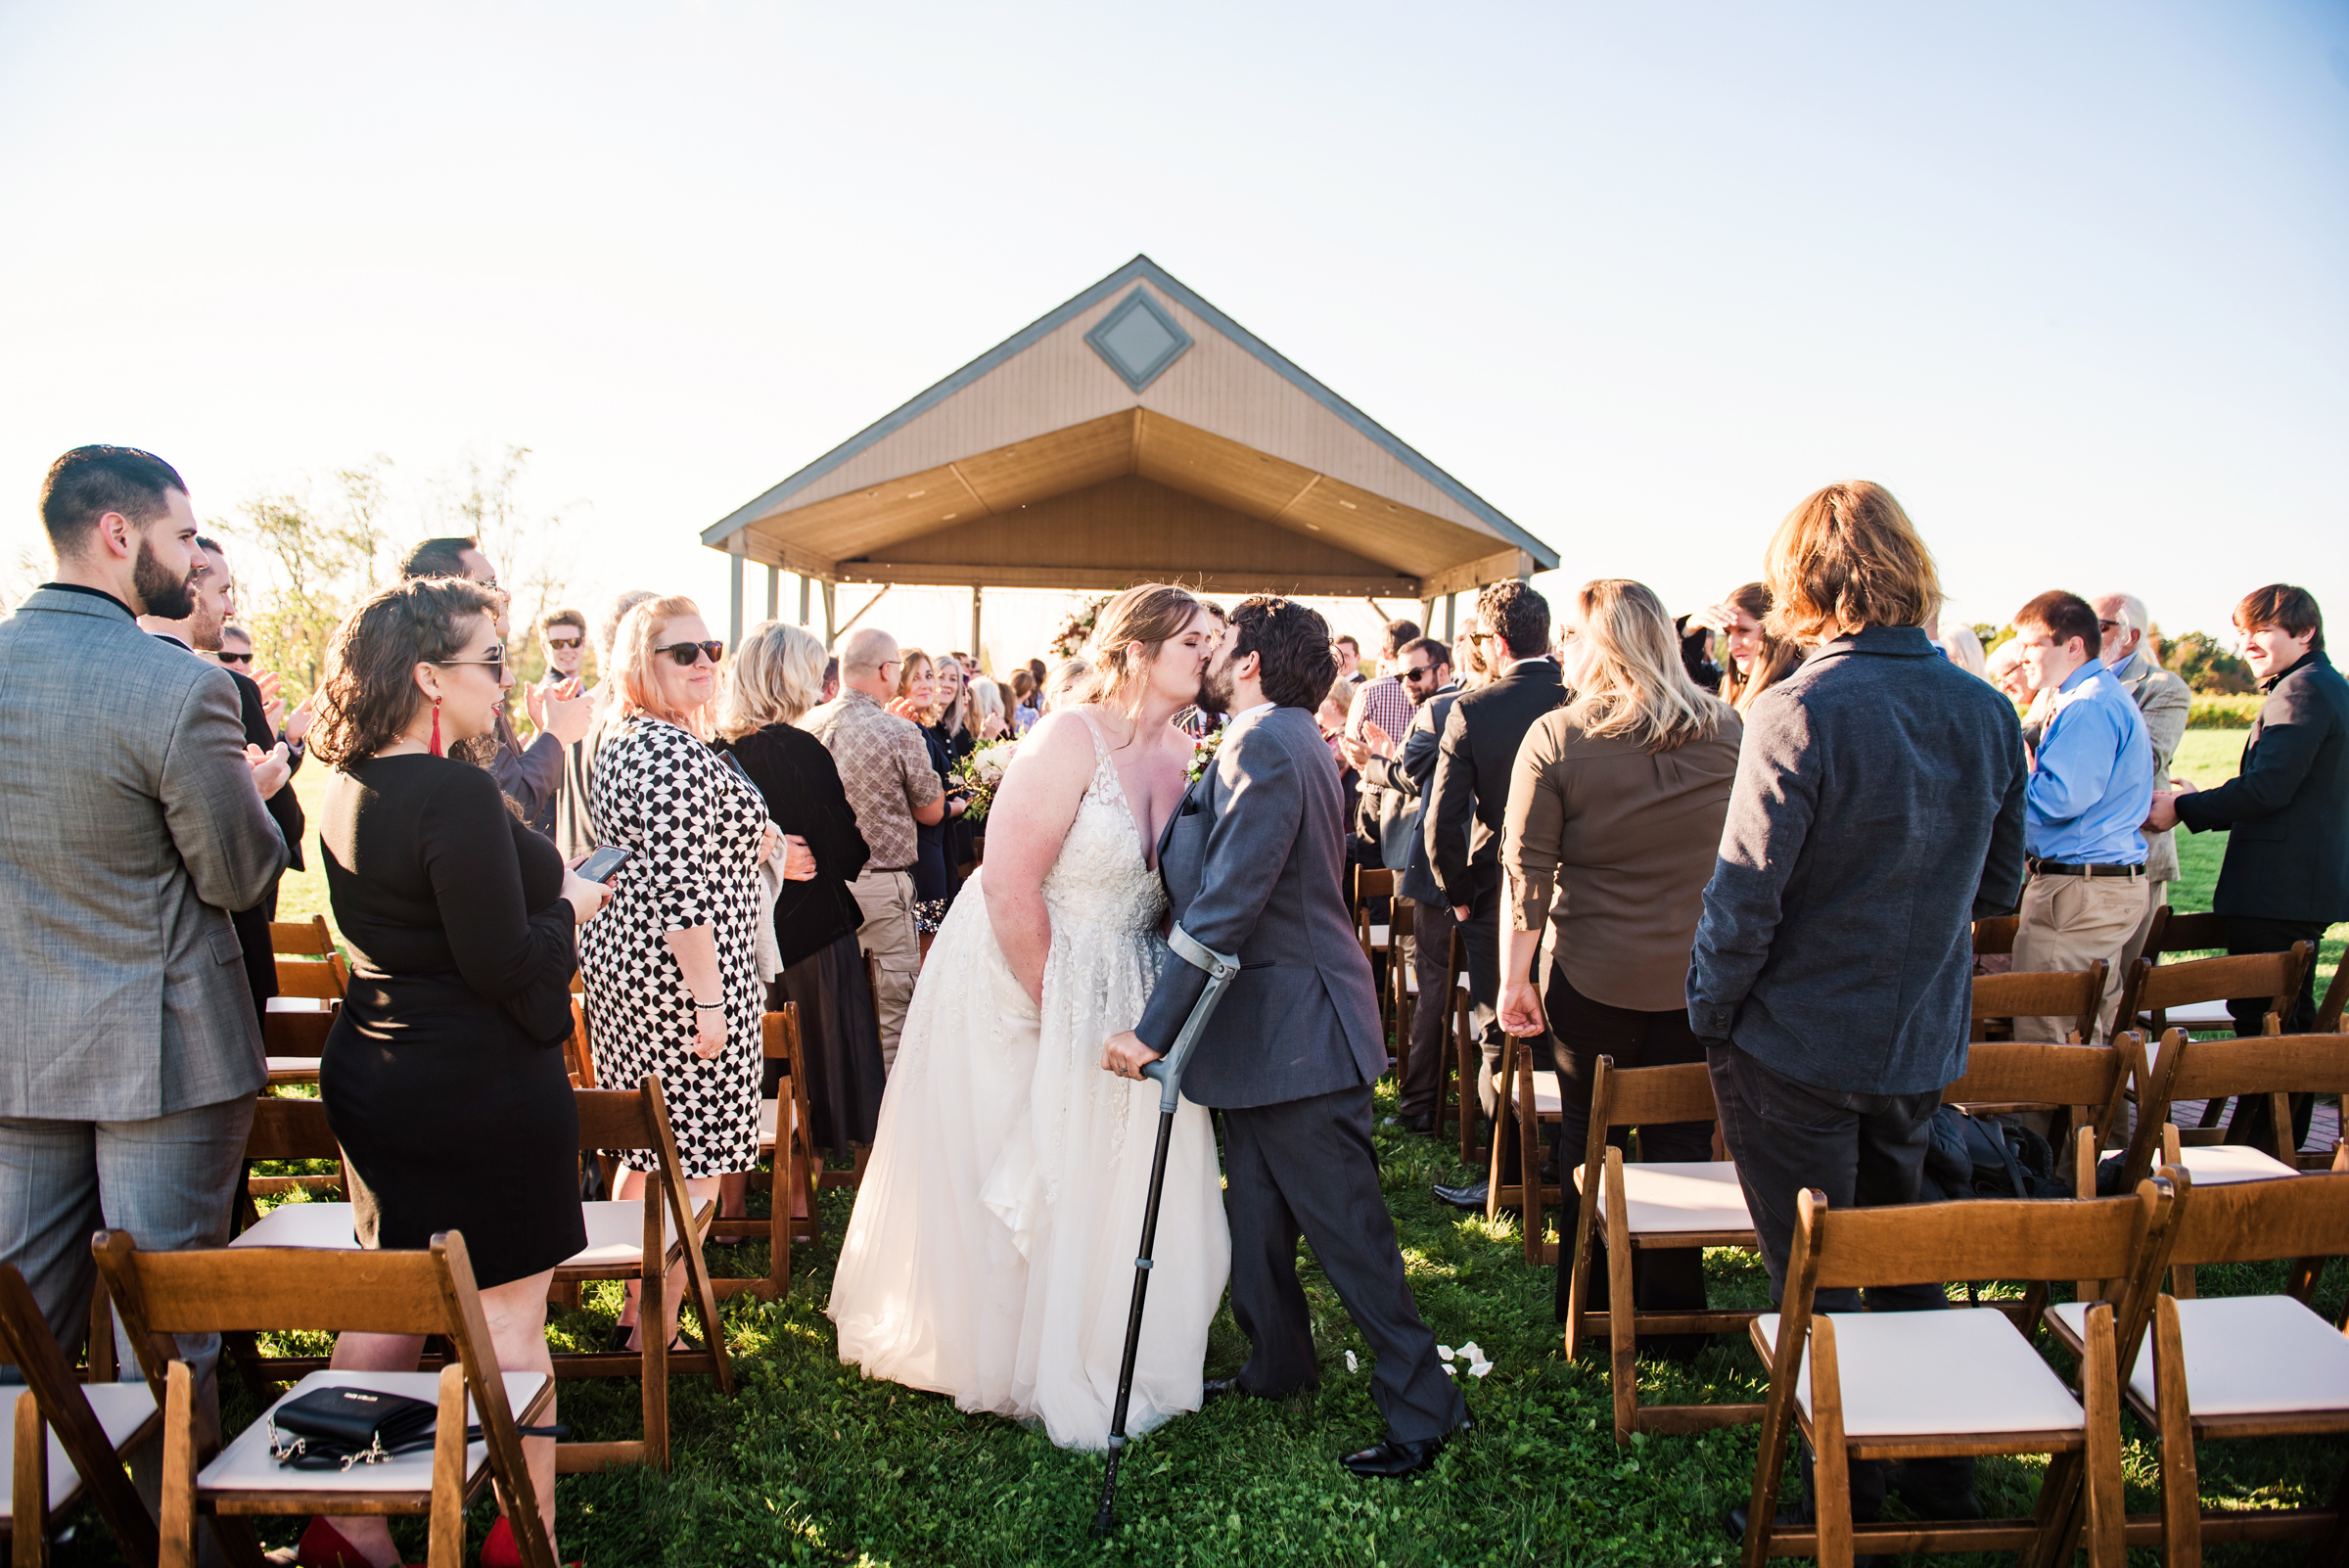 Zugibe_Vineyards_Finger_Lakes_Wedding_JILL_STUDIO_Rochester_NY_Photographer_DSC_4033.jpg